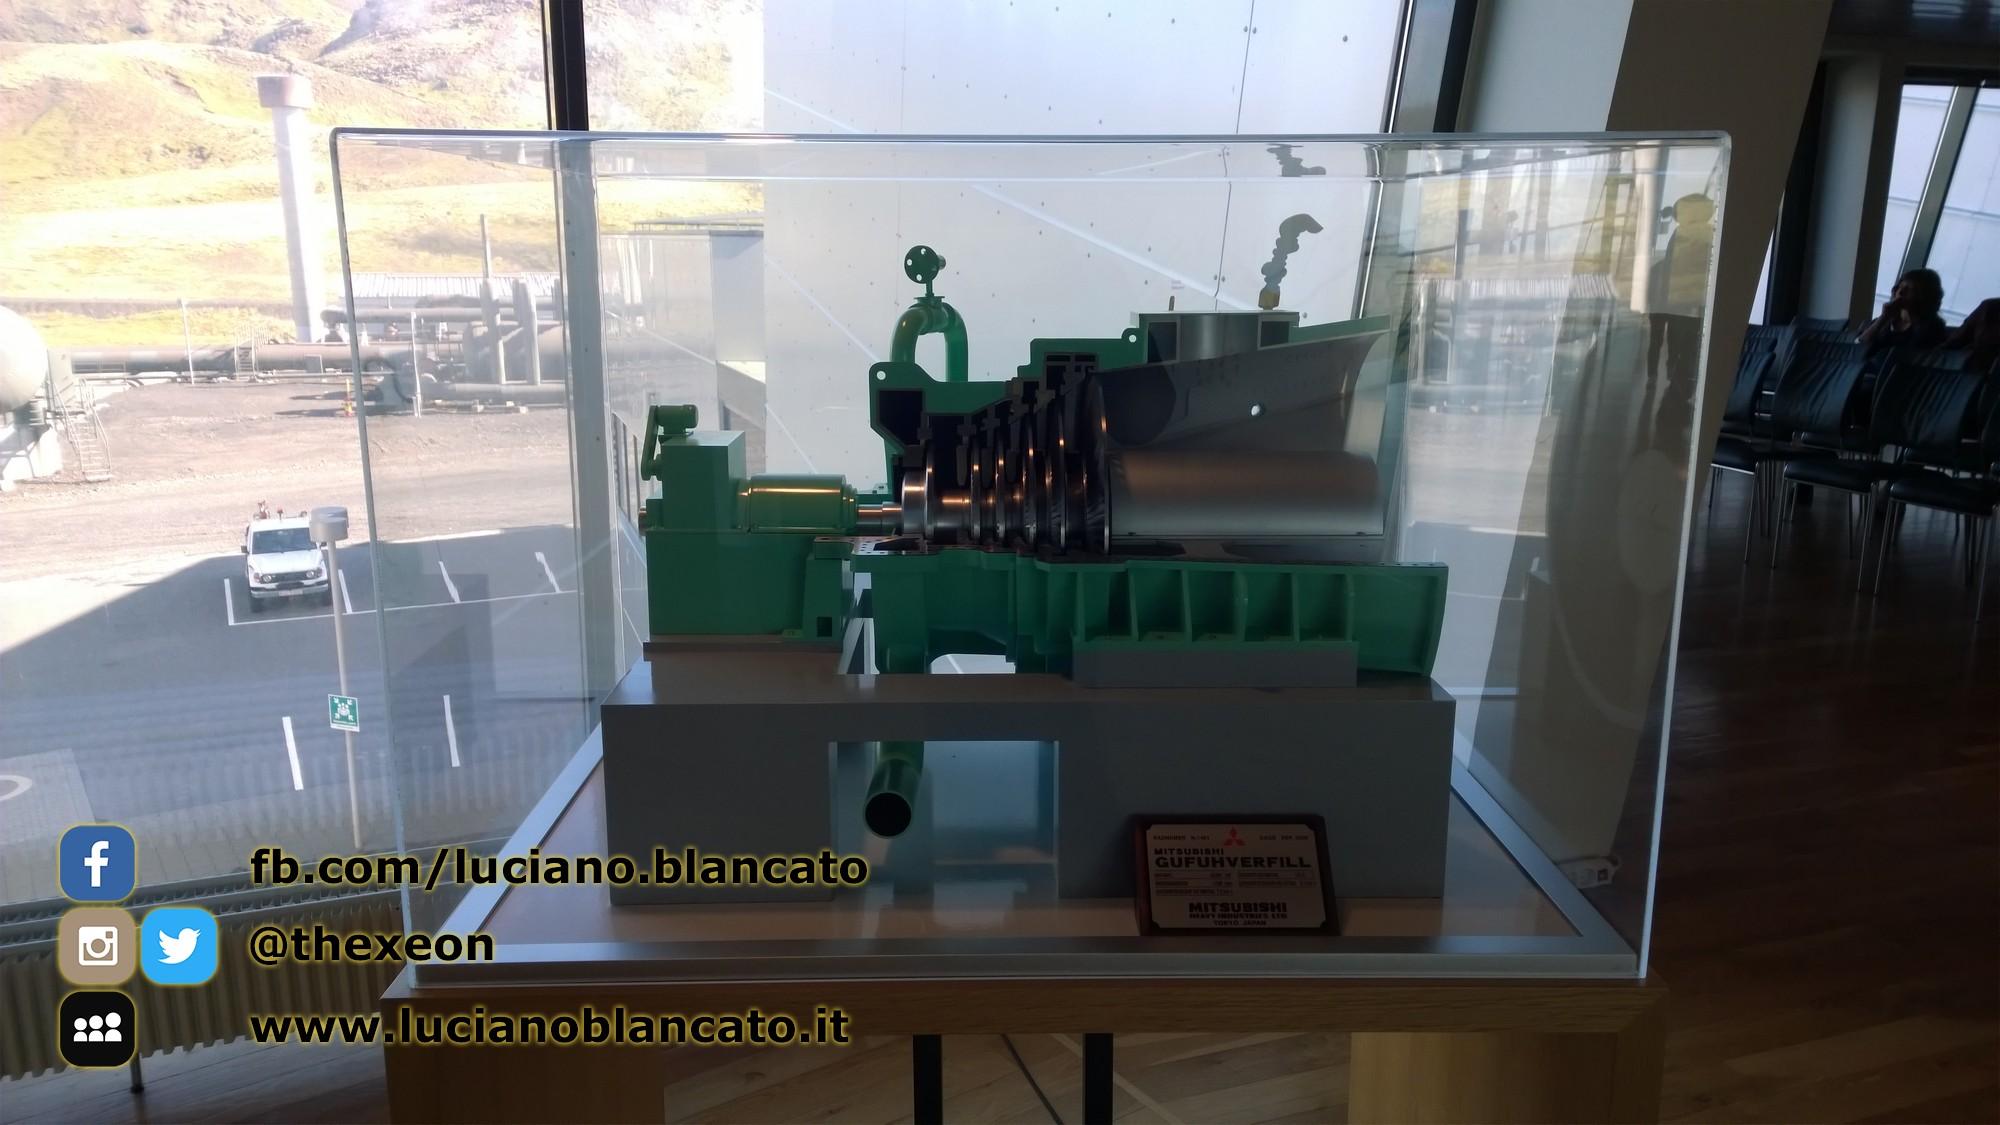 Iceland - Nesjavellir Geothermal Power Station, South, Iceland